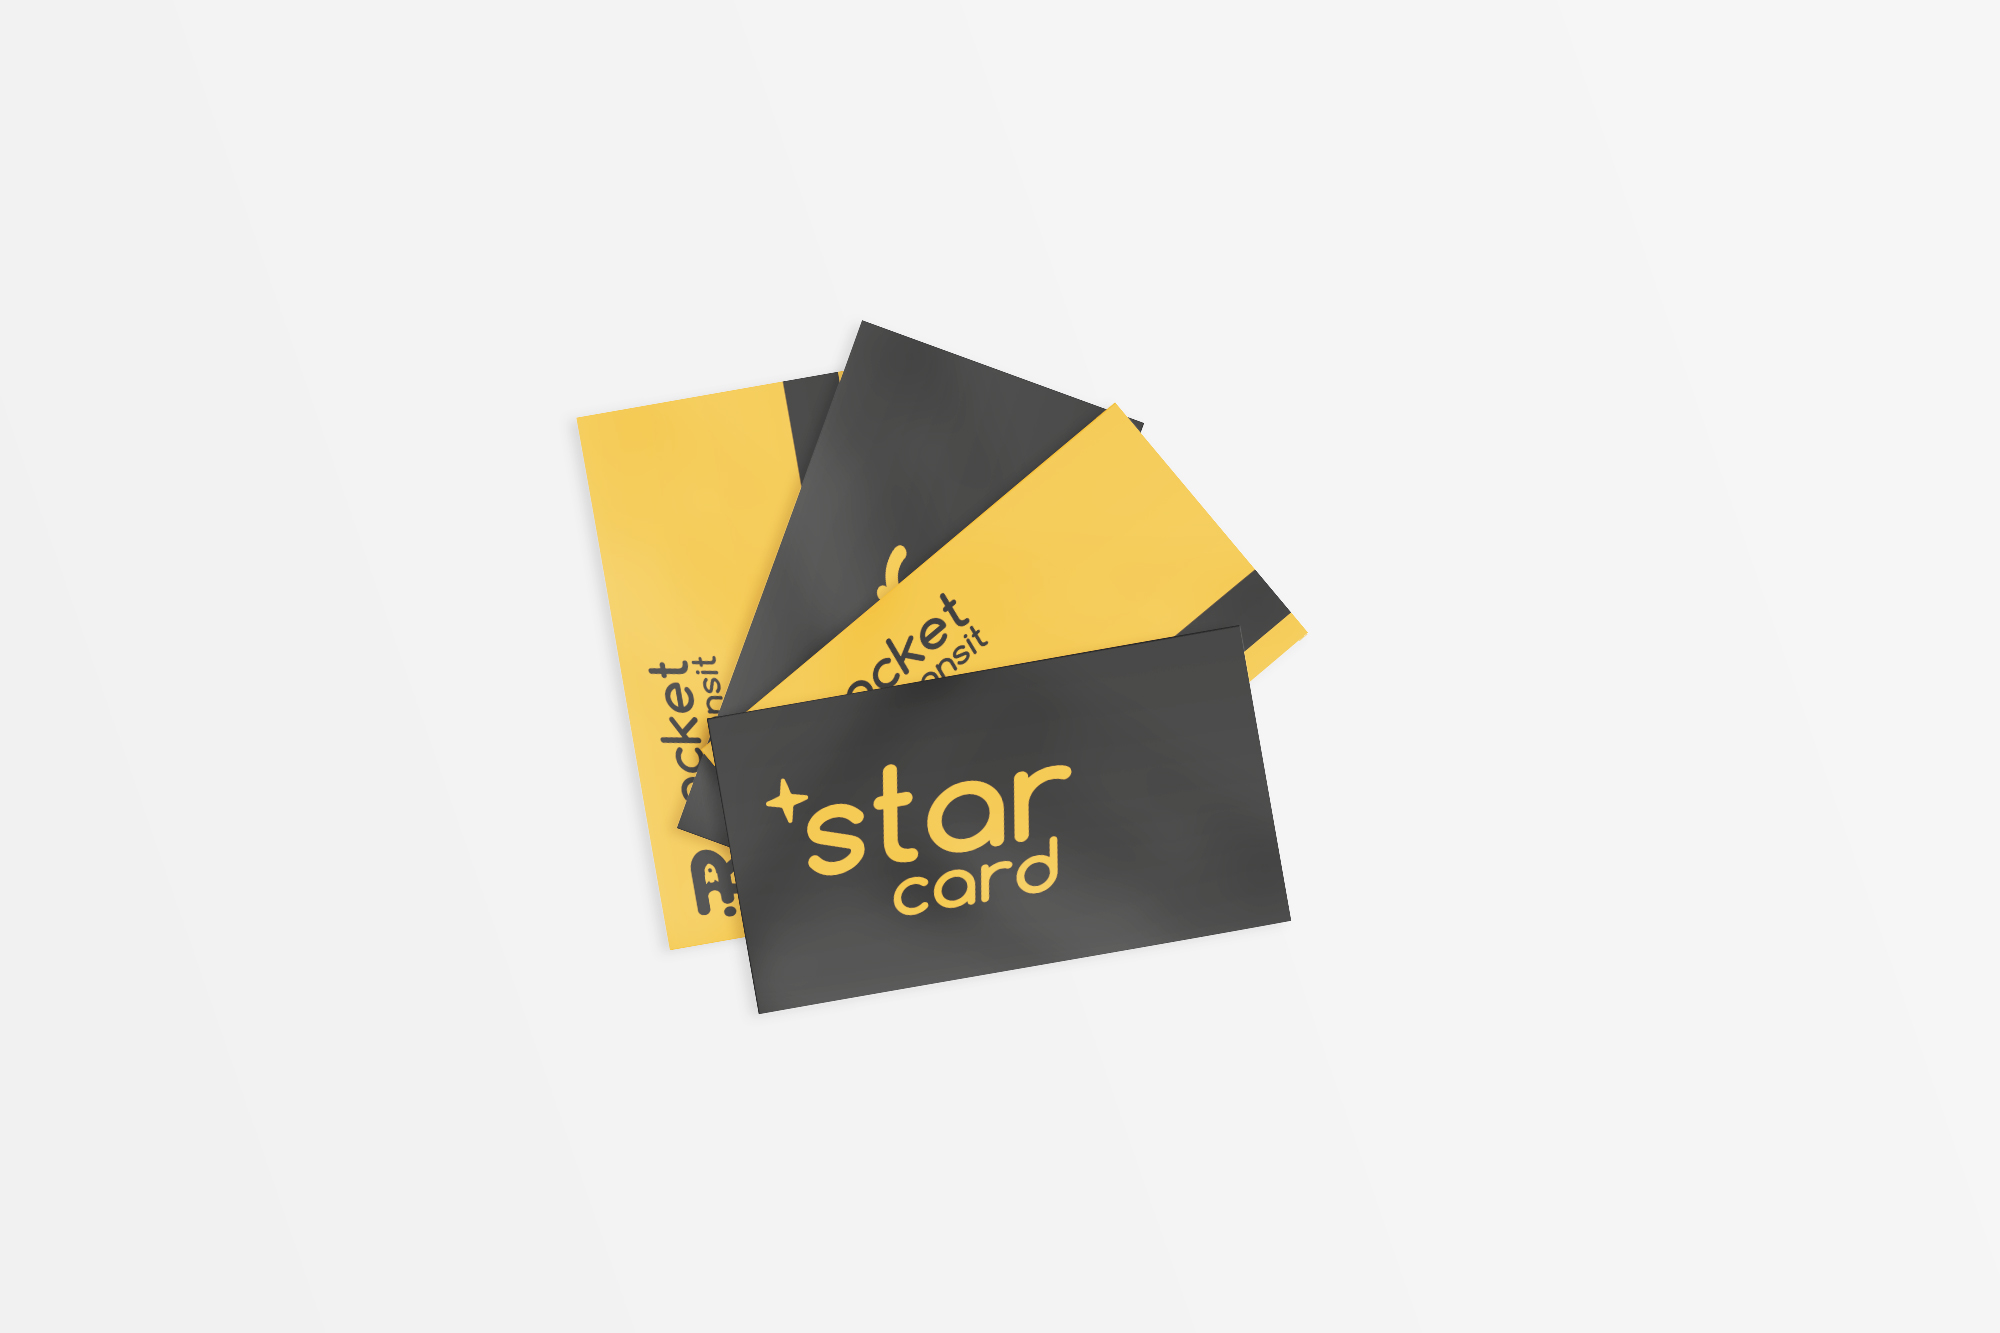 CityofHSV_PublicTransit_Rebrand_CONCEPT3_StarCard_R1-v1-mockup.jpg